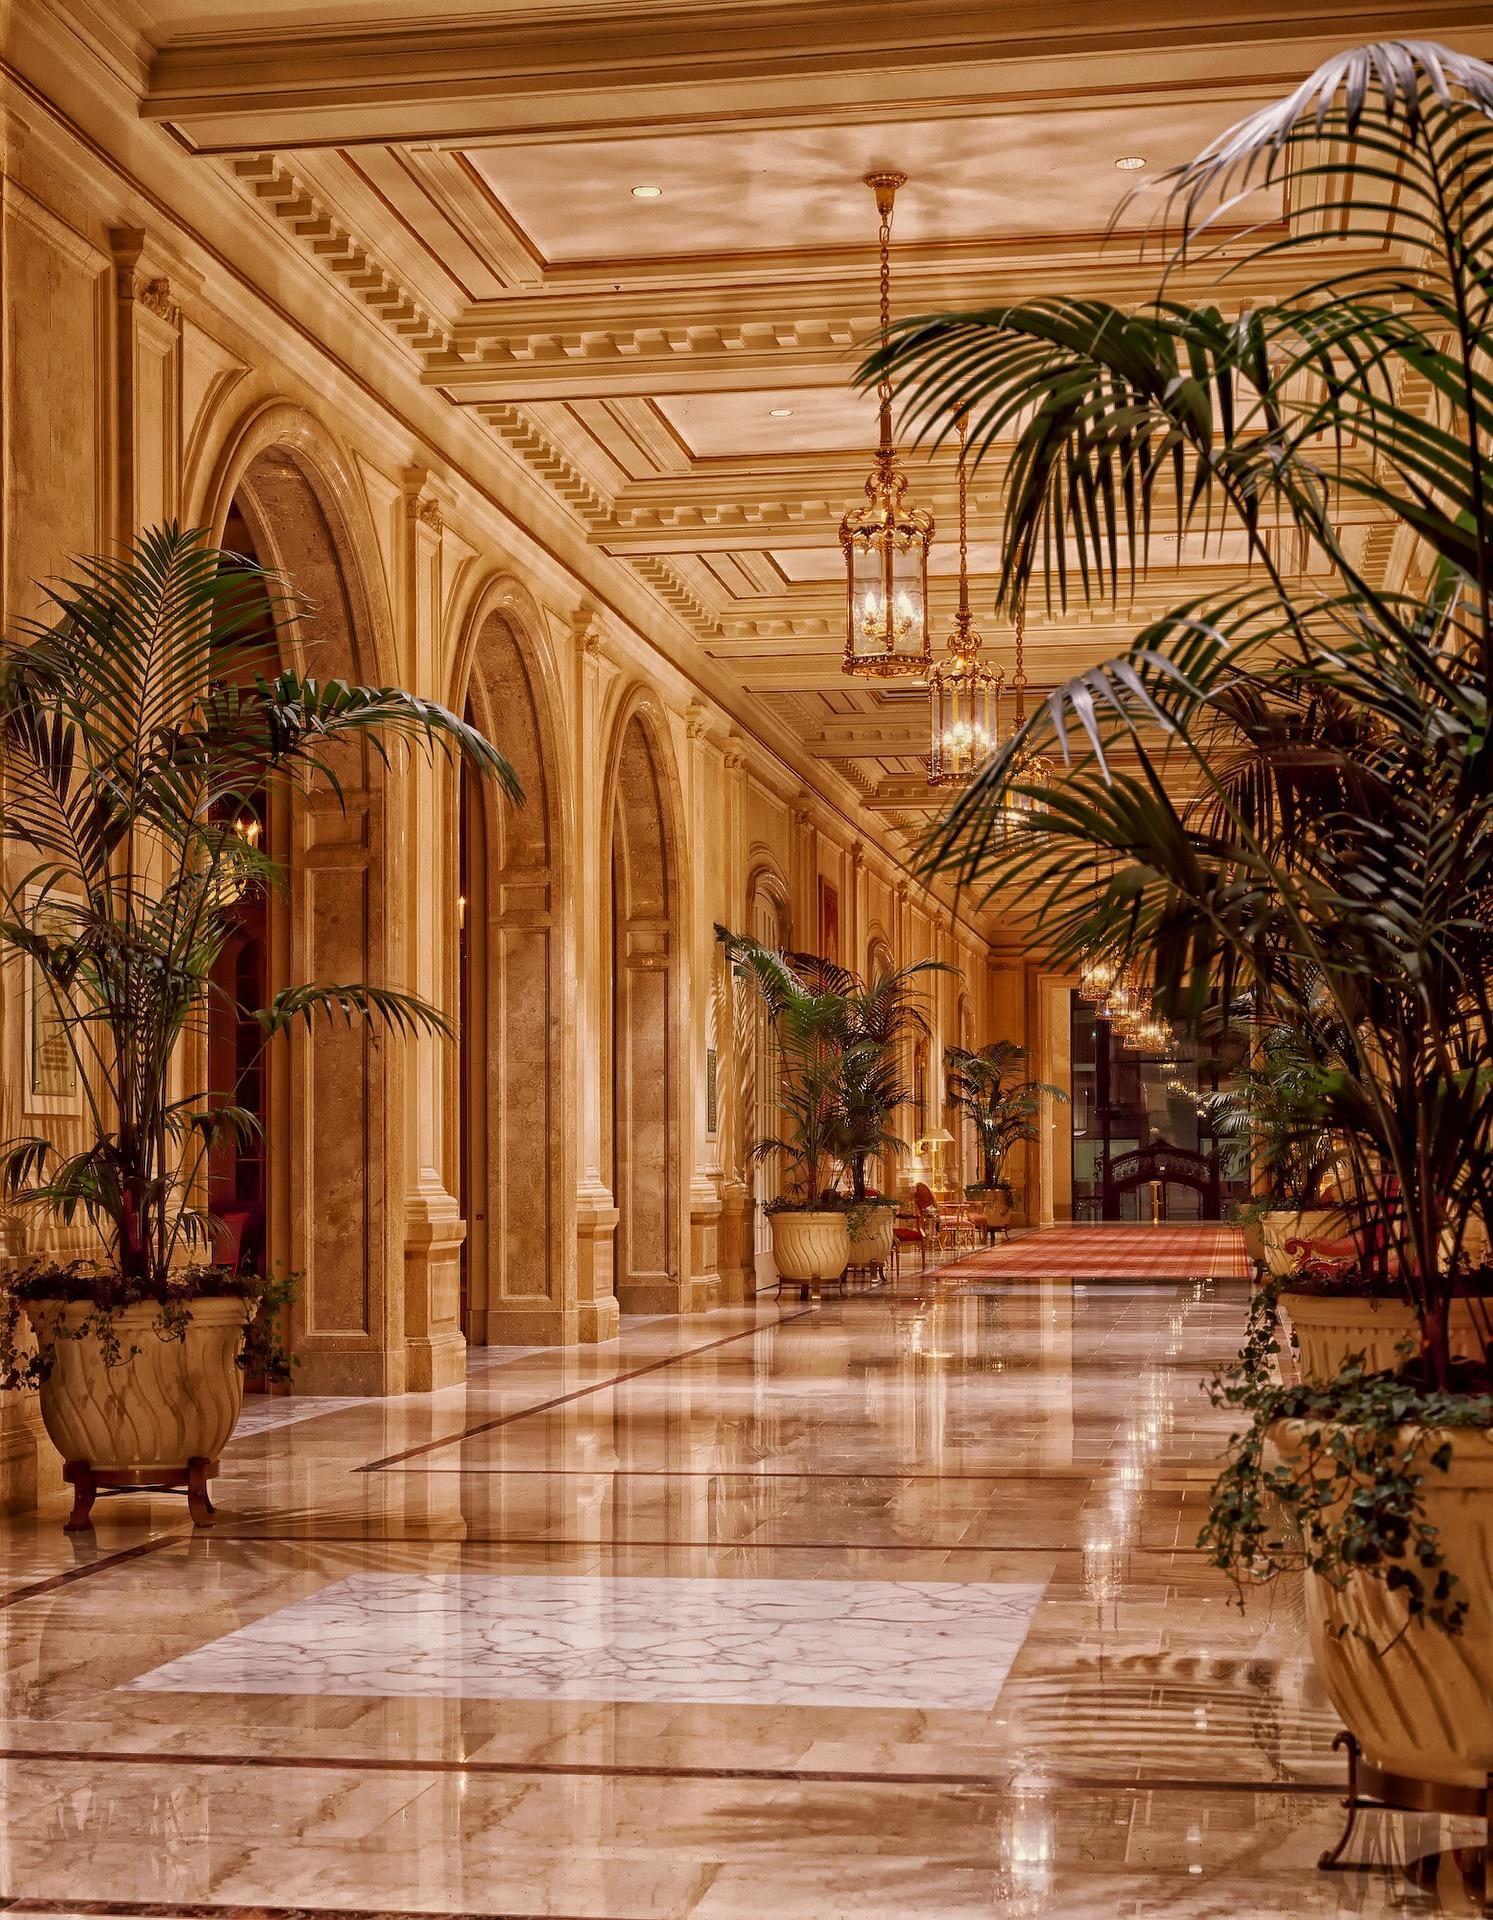 Palace_Sheraton_photo_pixabay_free